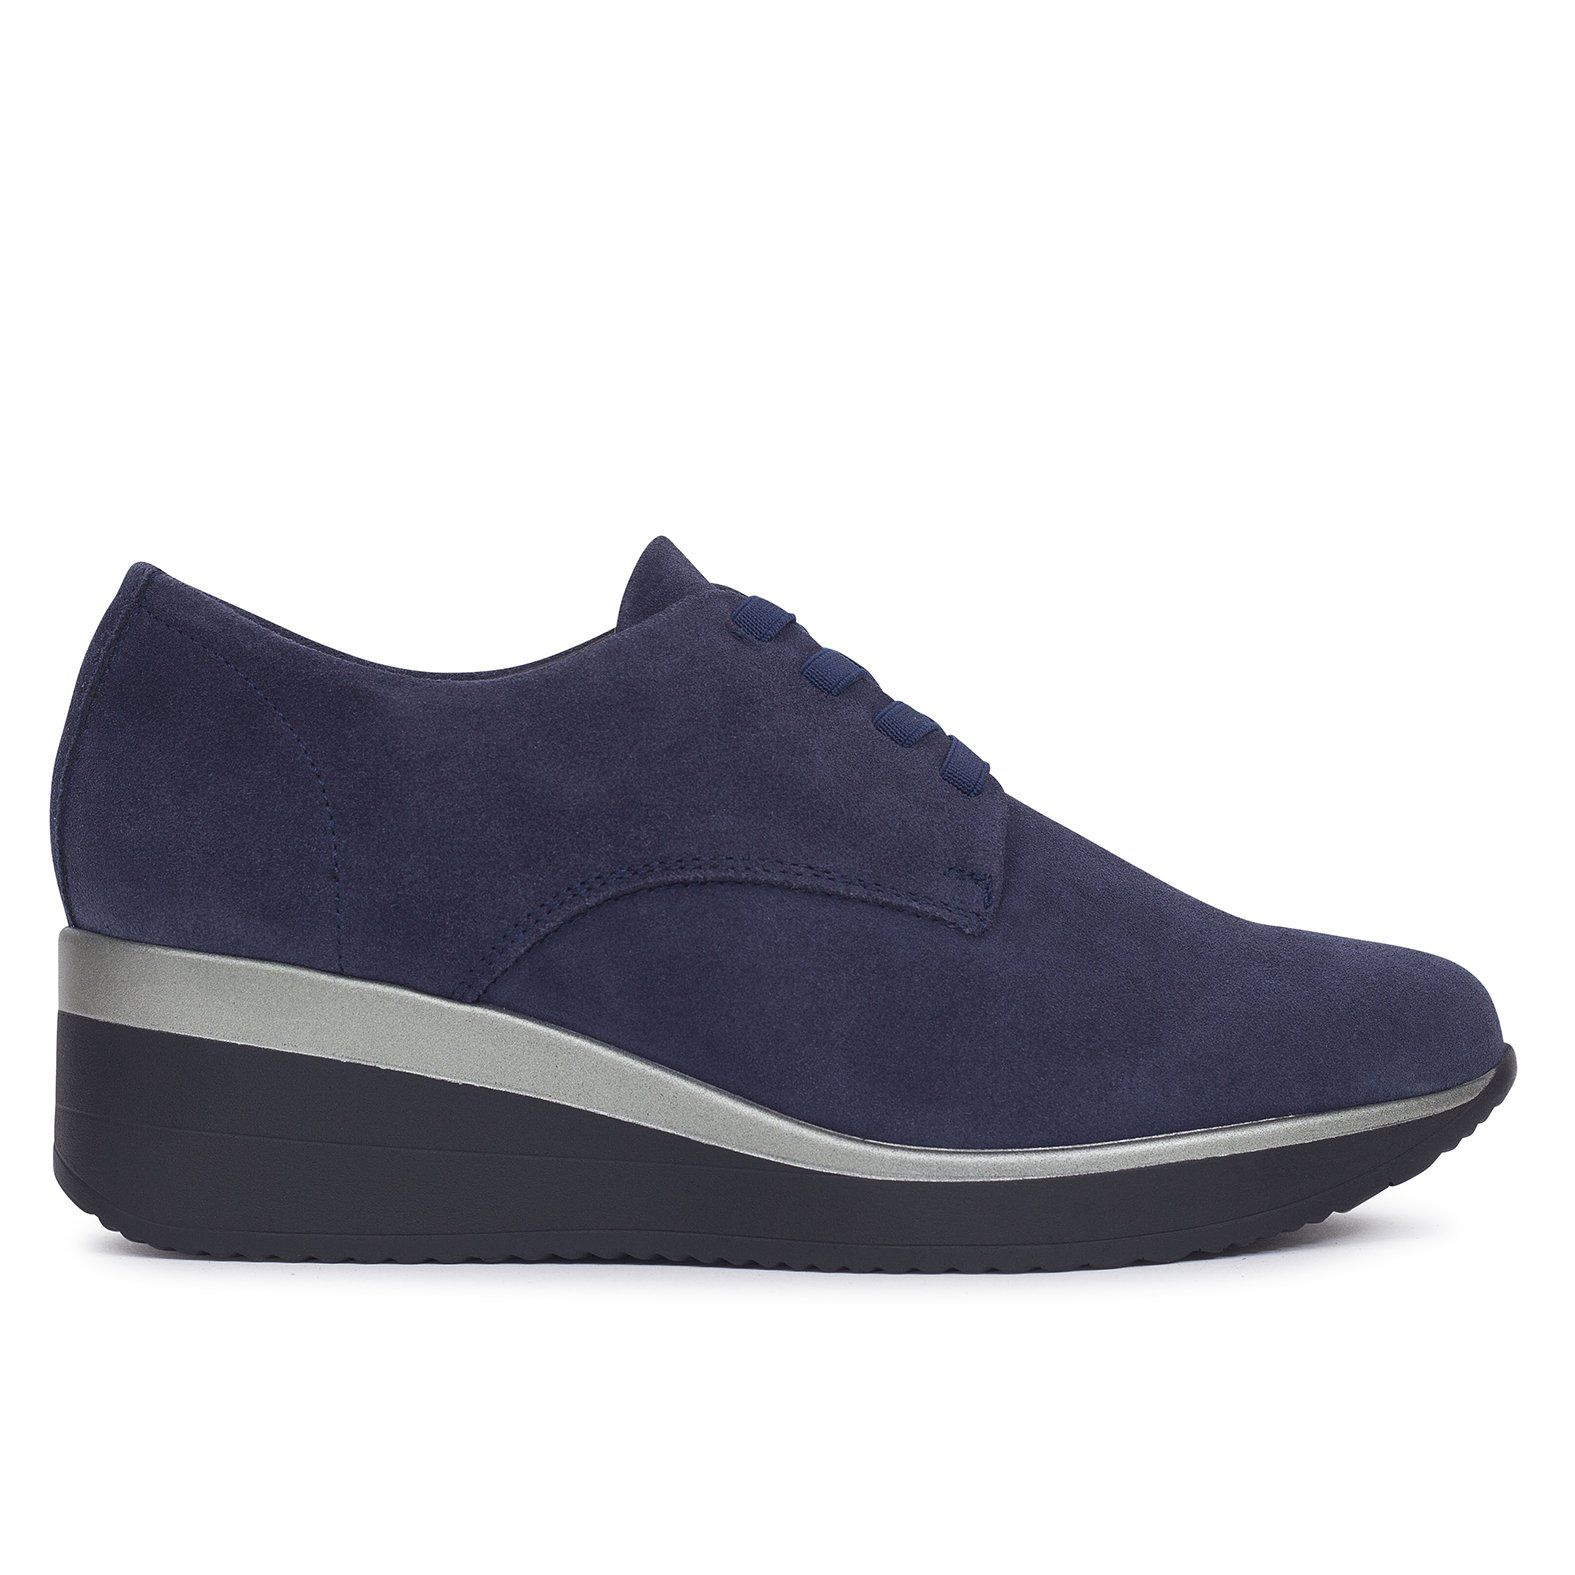 d21320a470ce4 Zapato blucher mujer AZUL de piel Zapatos online de marca miMaO – miMaO  ShopOnline